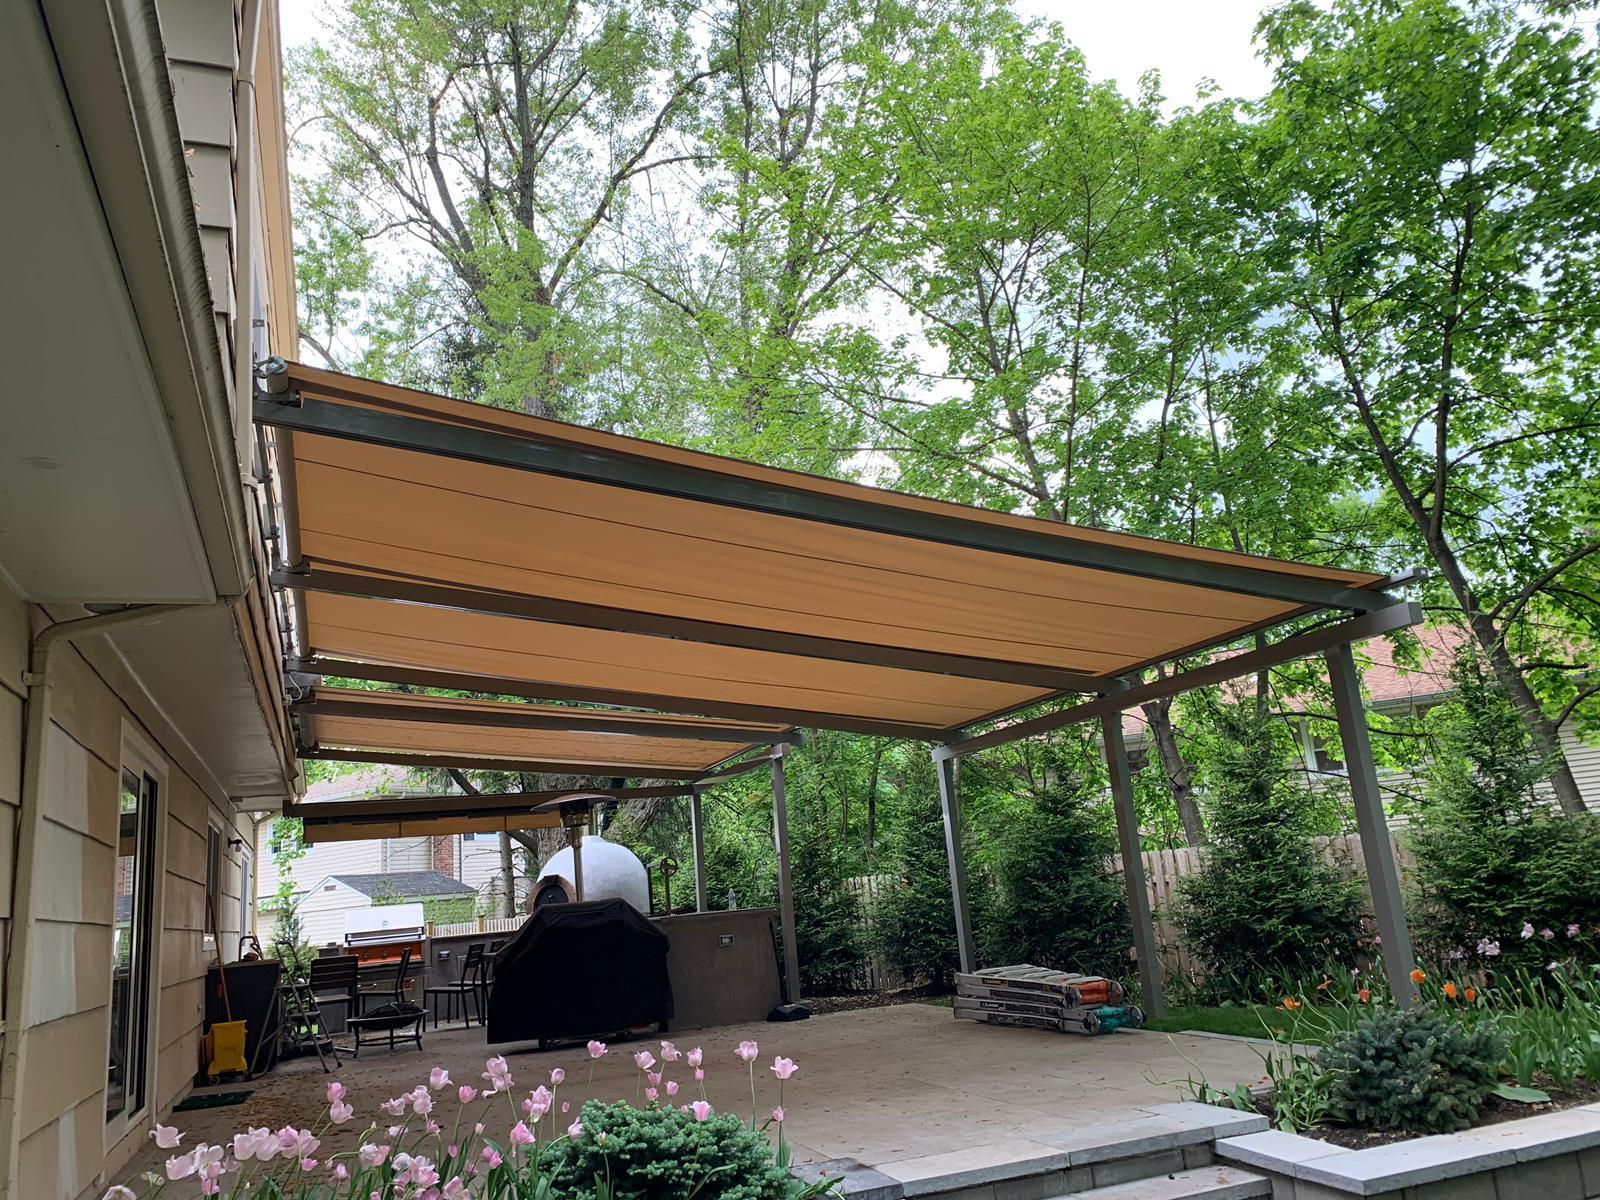 Alutex Solaria Retractable Canopy - Chatham NJ - Breslow Home Design Center